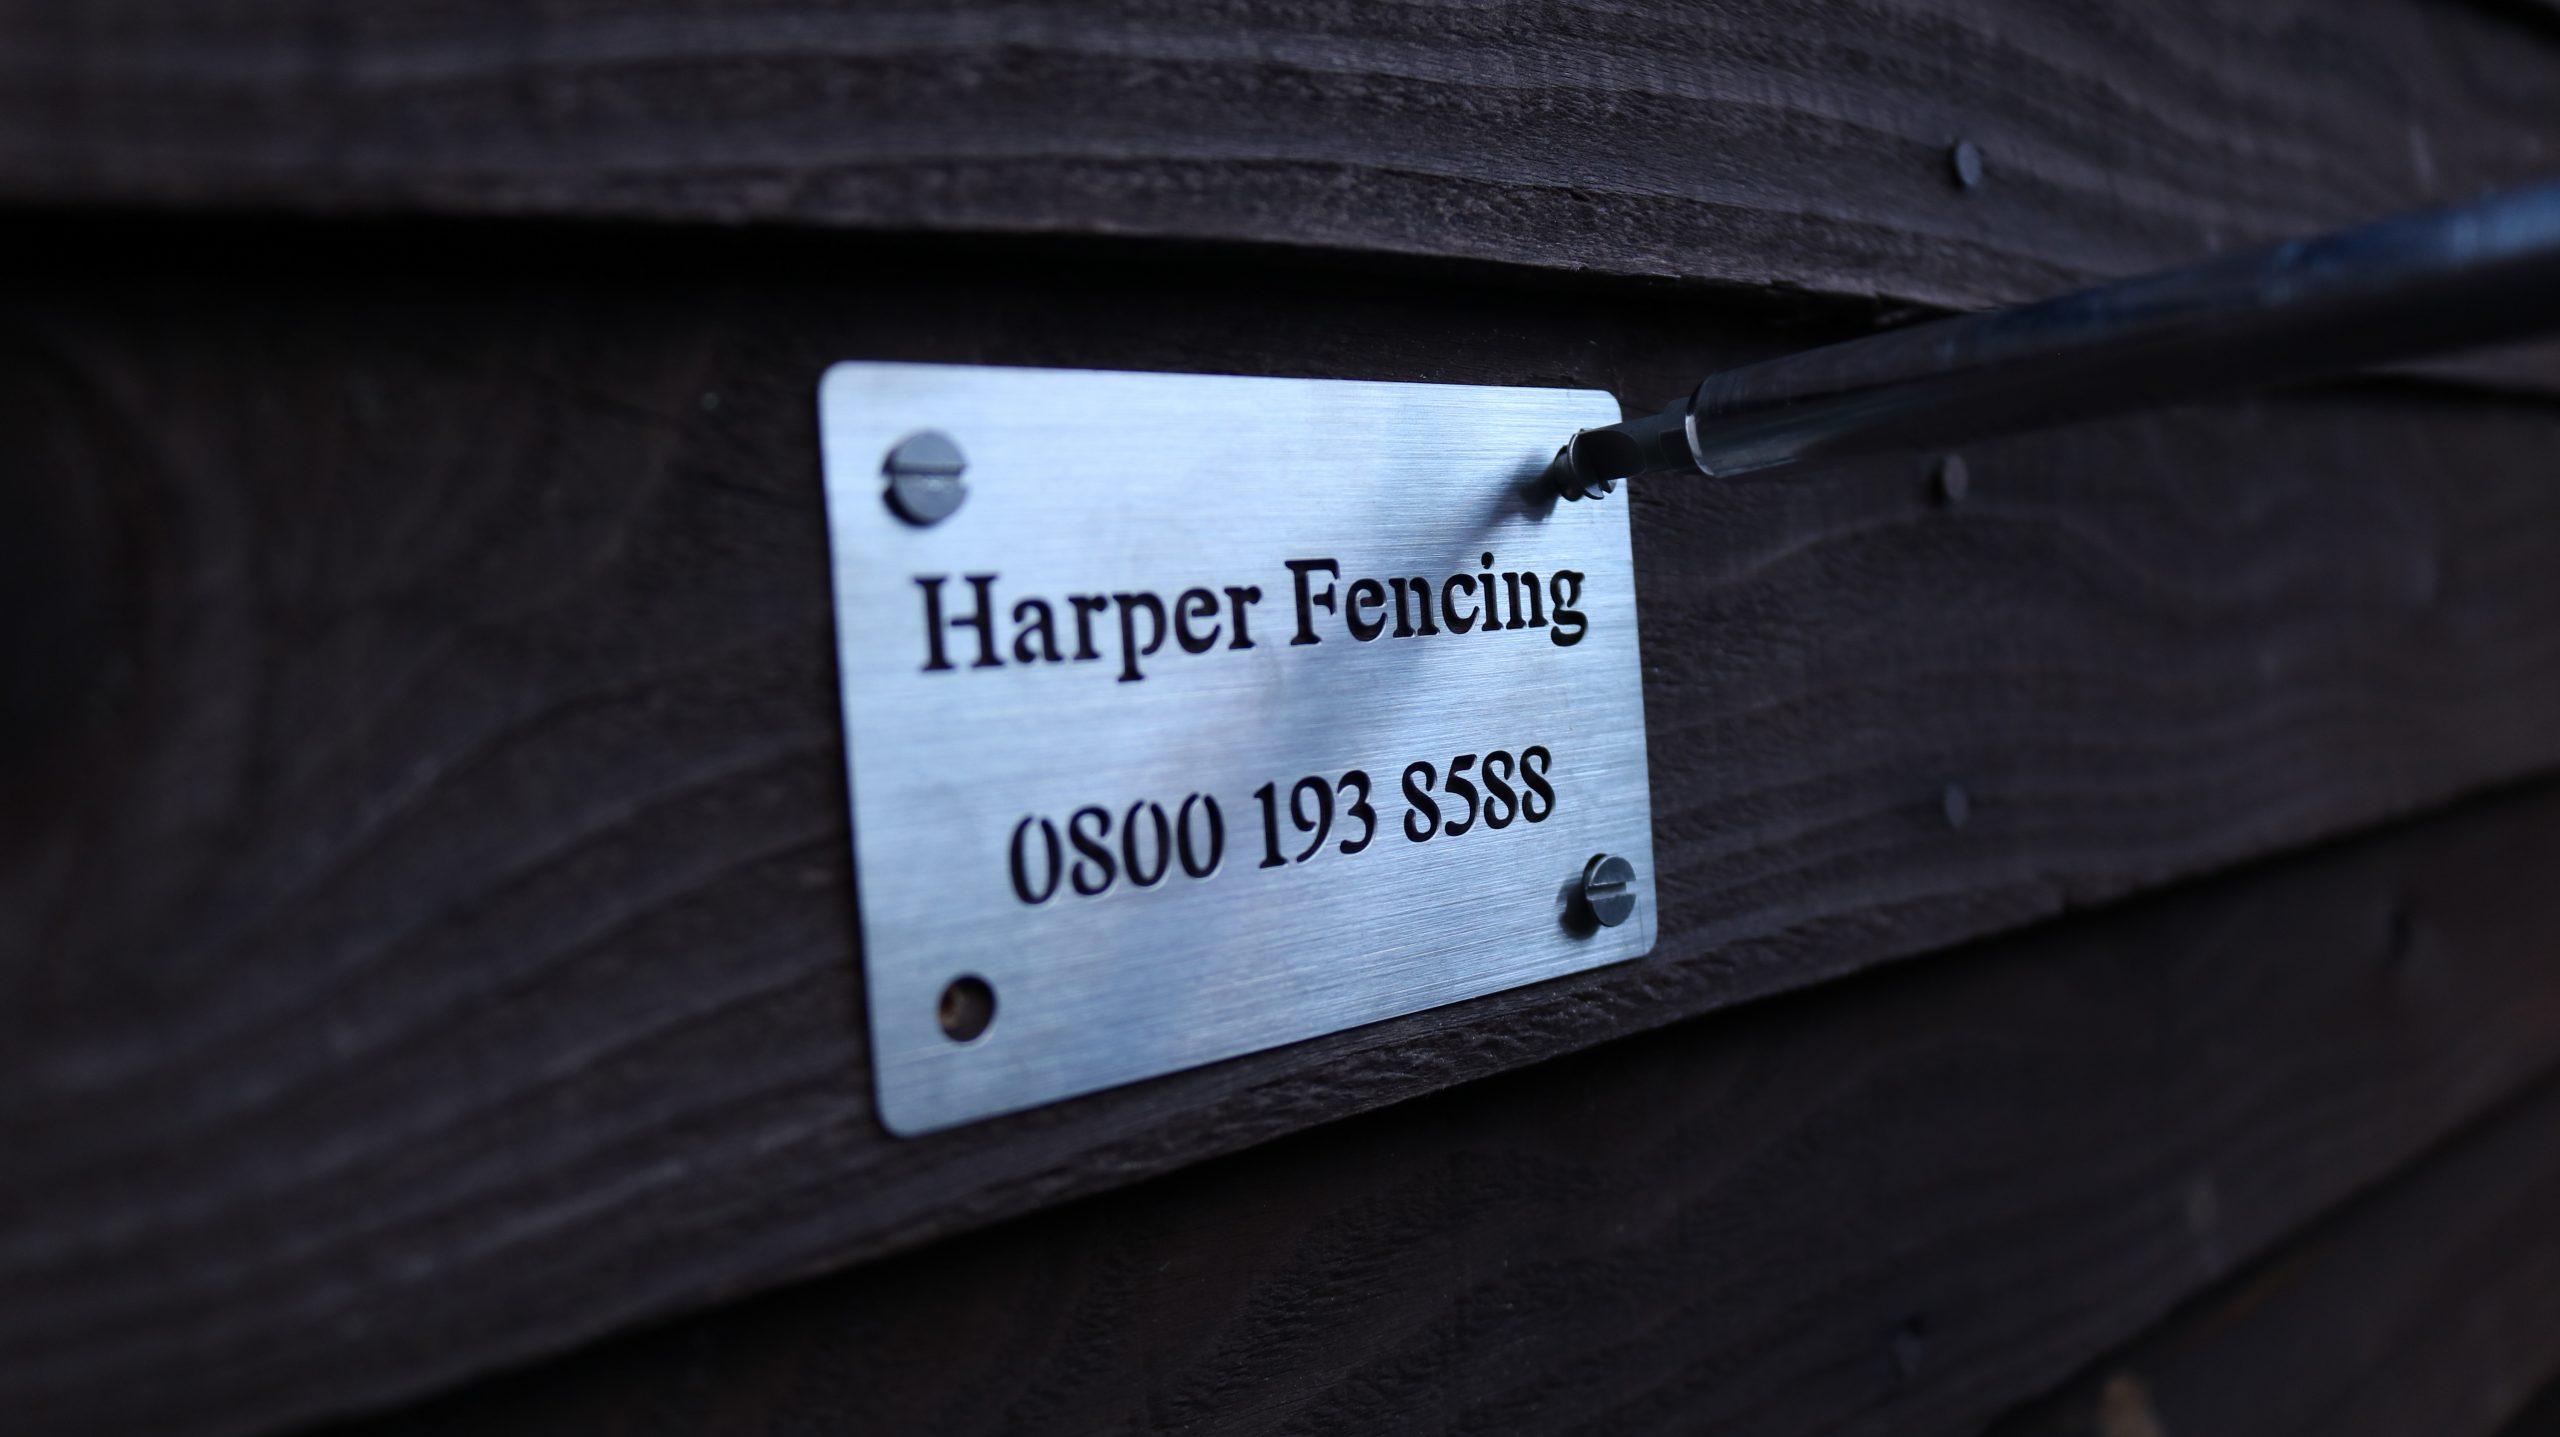 Harper Fencing - Metal Business Card